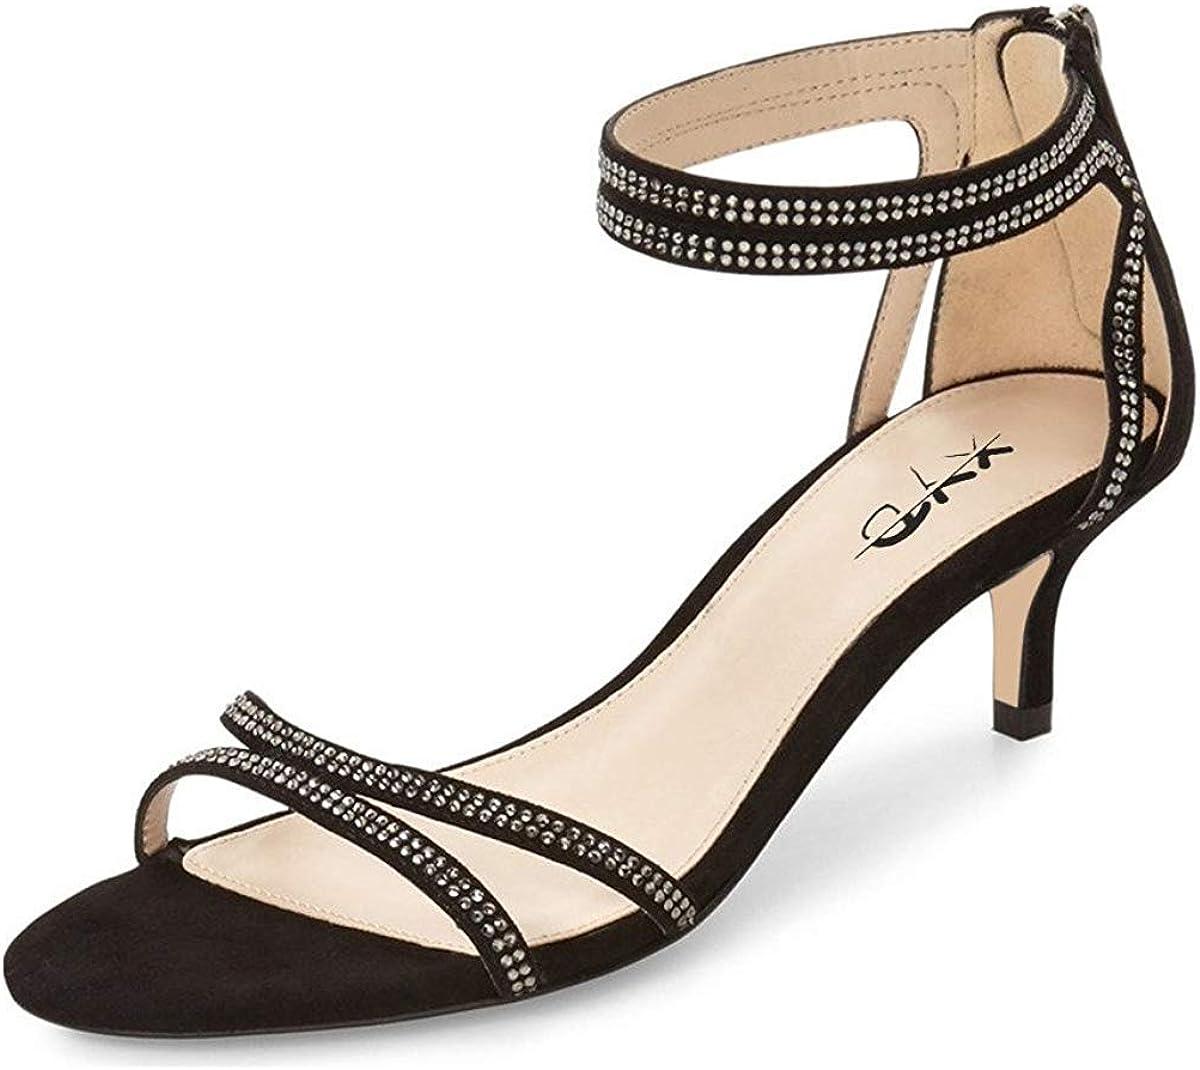 XYD Women Open Toe Shipping included Low Heel Ankle Overseas parallel import regular item Str Rhinestone Strappy Sandals